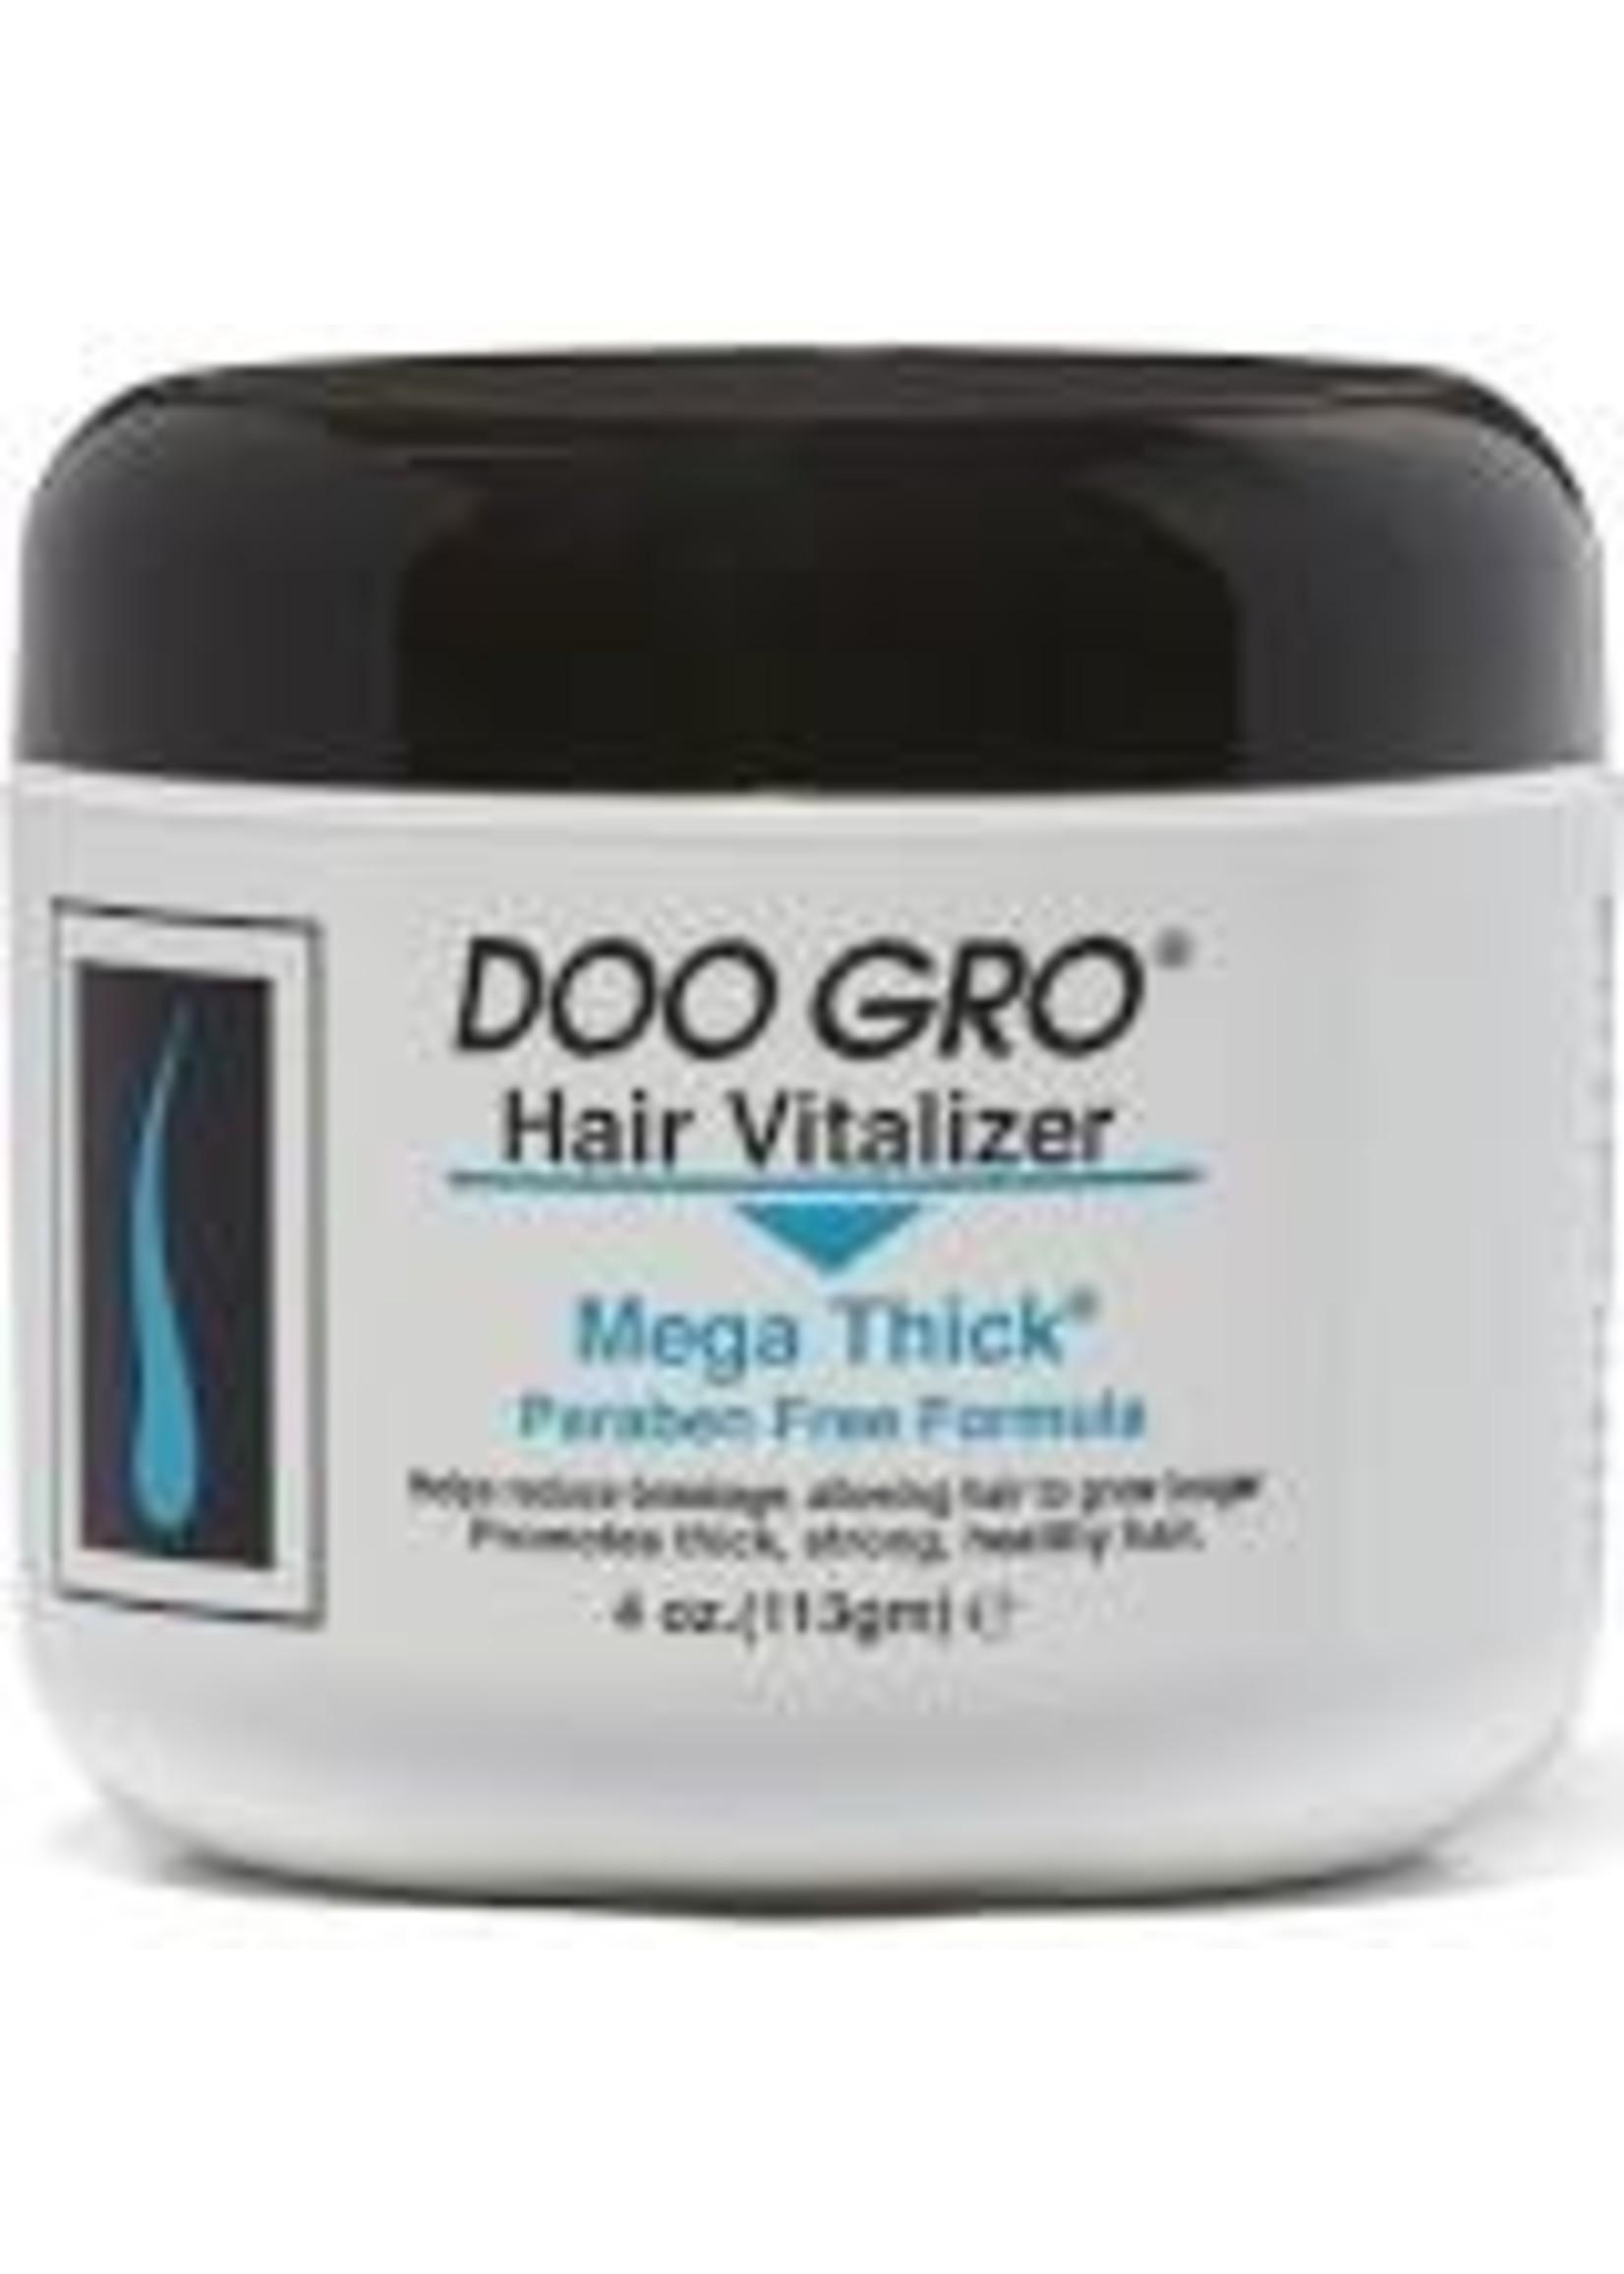 Doo Gro Hair Vitalizer Mega Thick